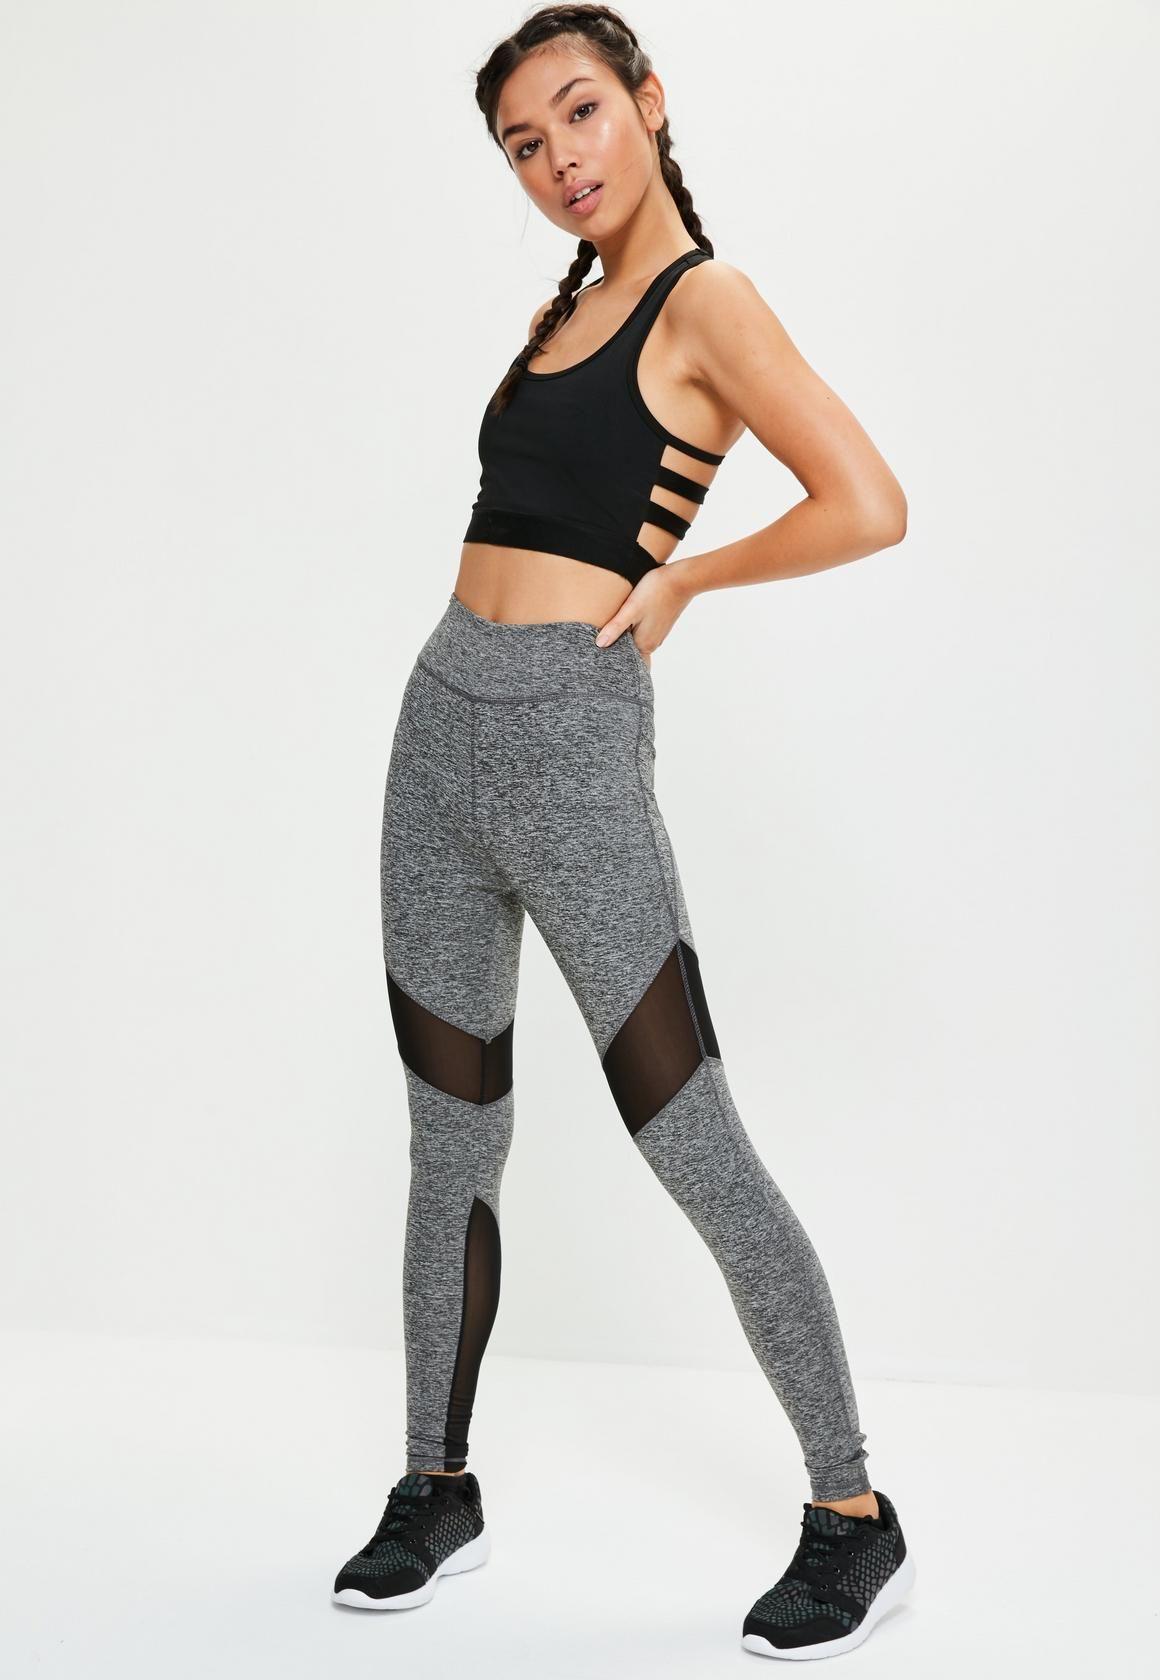 290edad4b26c8 Missguided - Active Grey Mesh Insert Full Length Sports Leggings ...